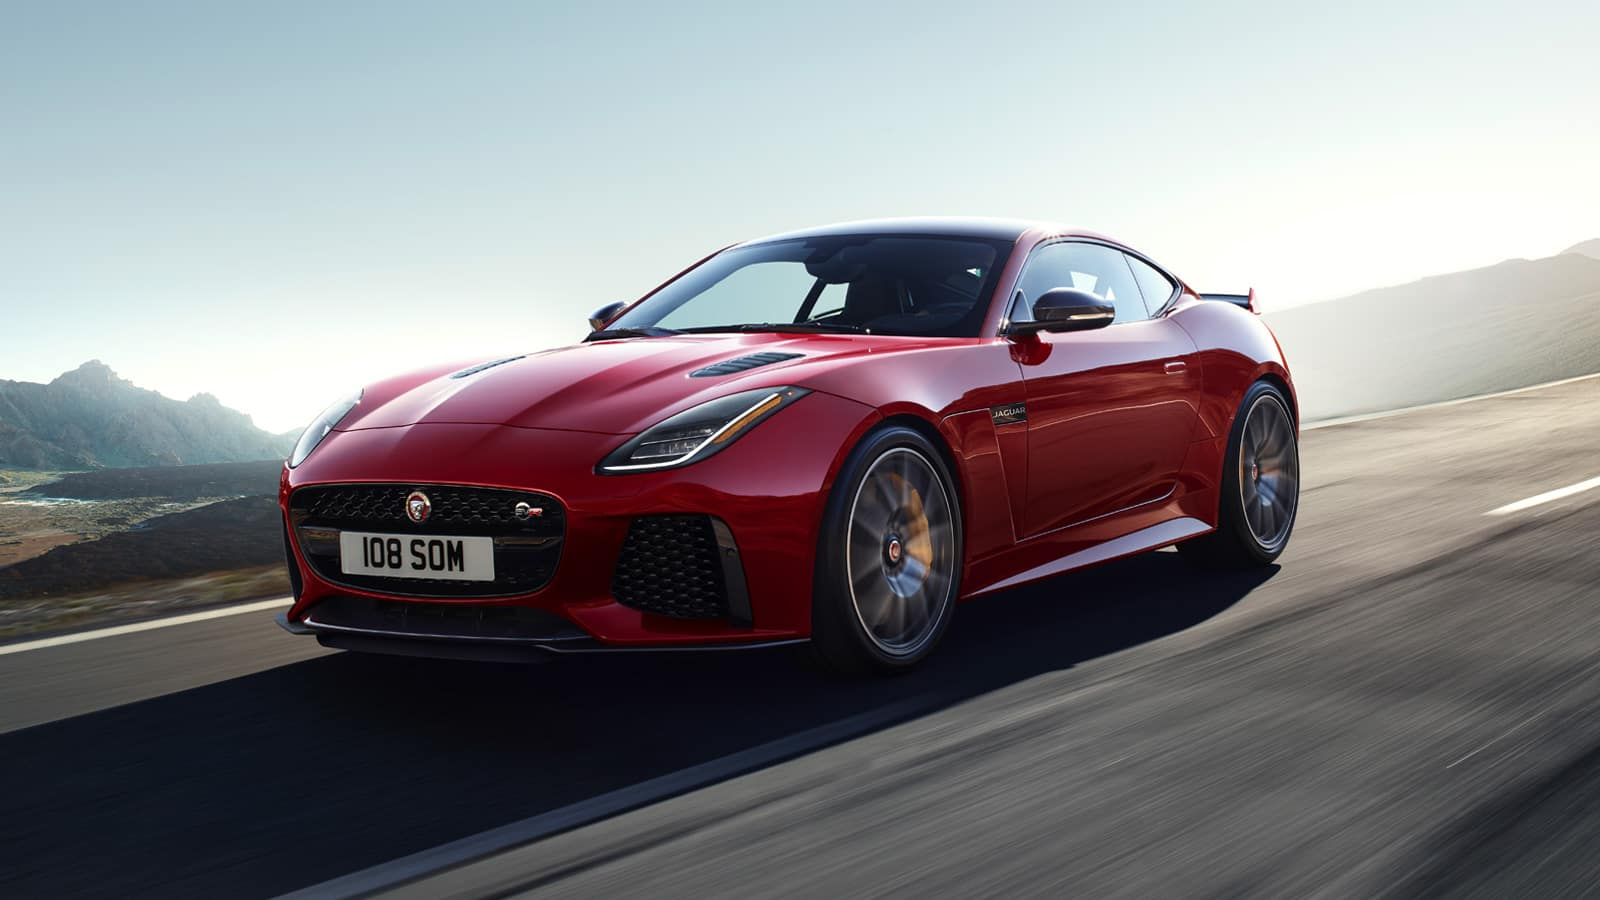 2020 Jaguar F-TYPE performance